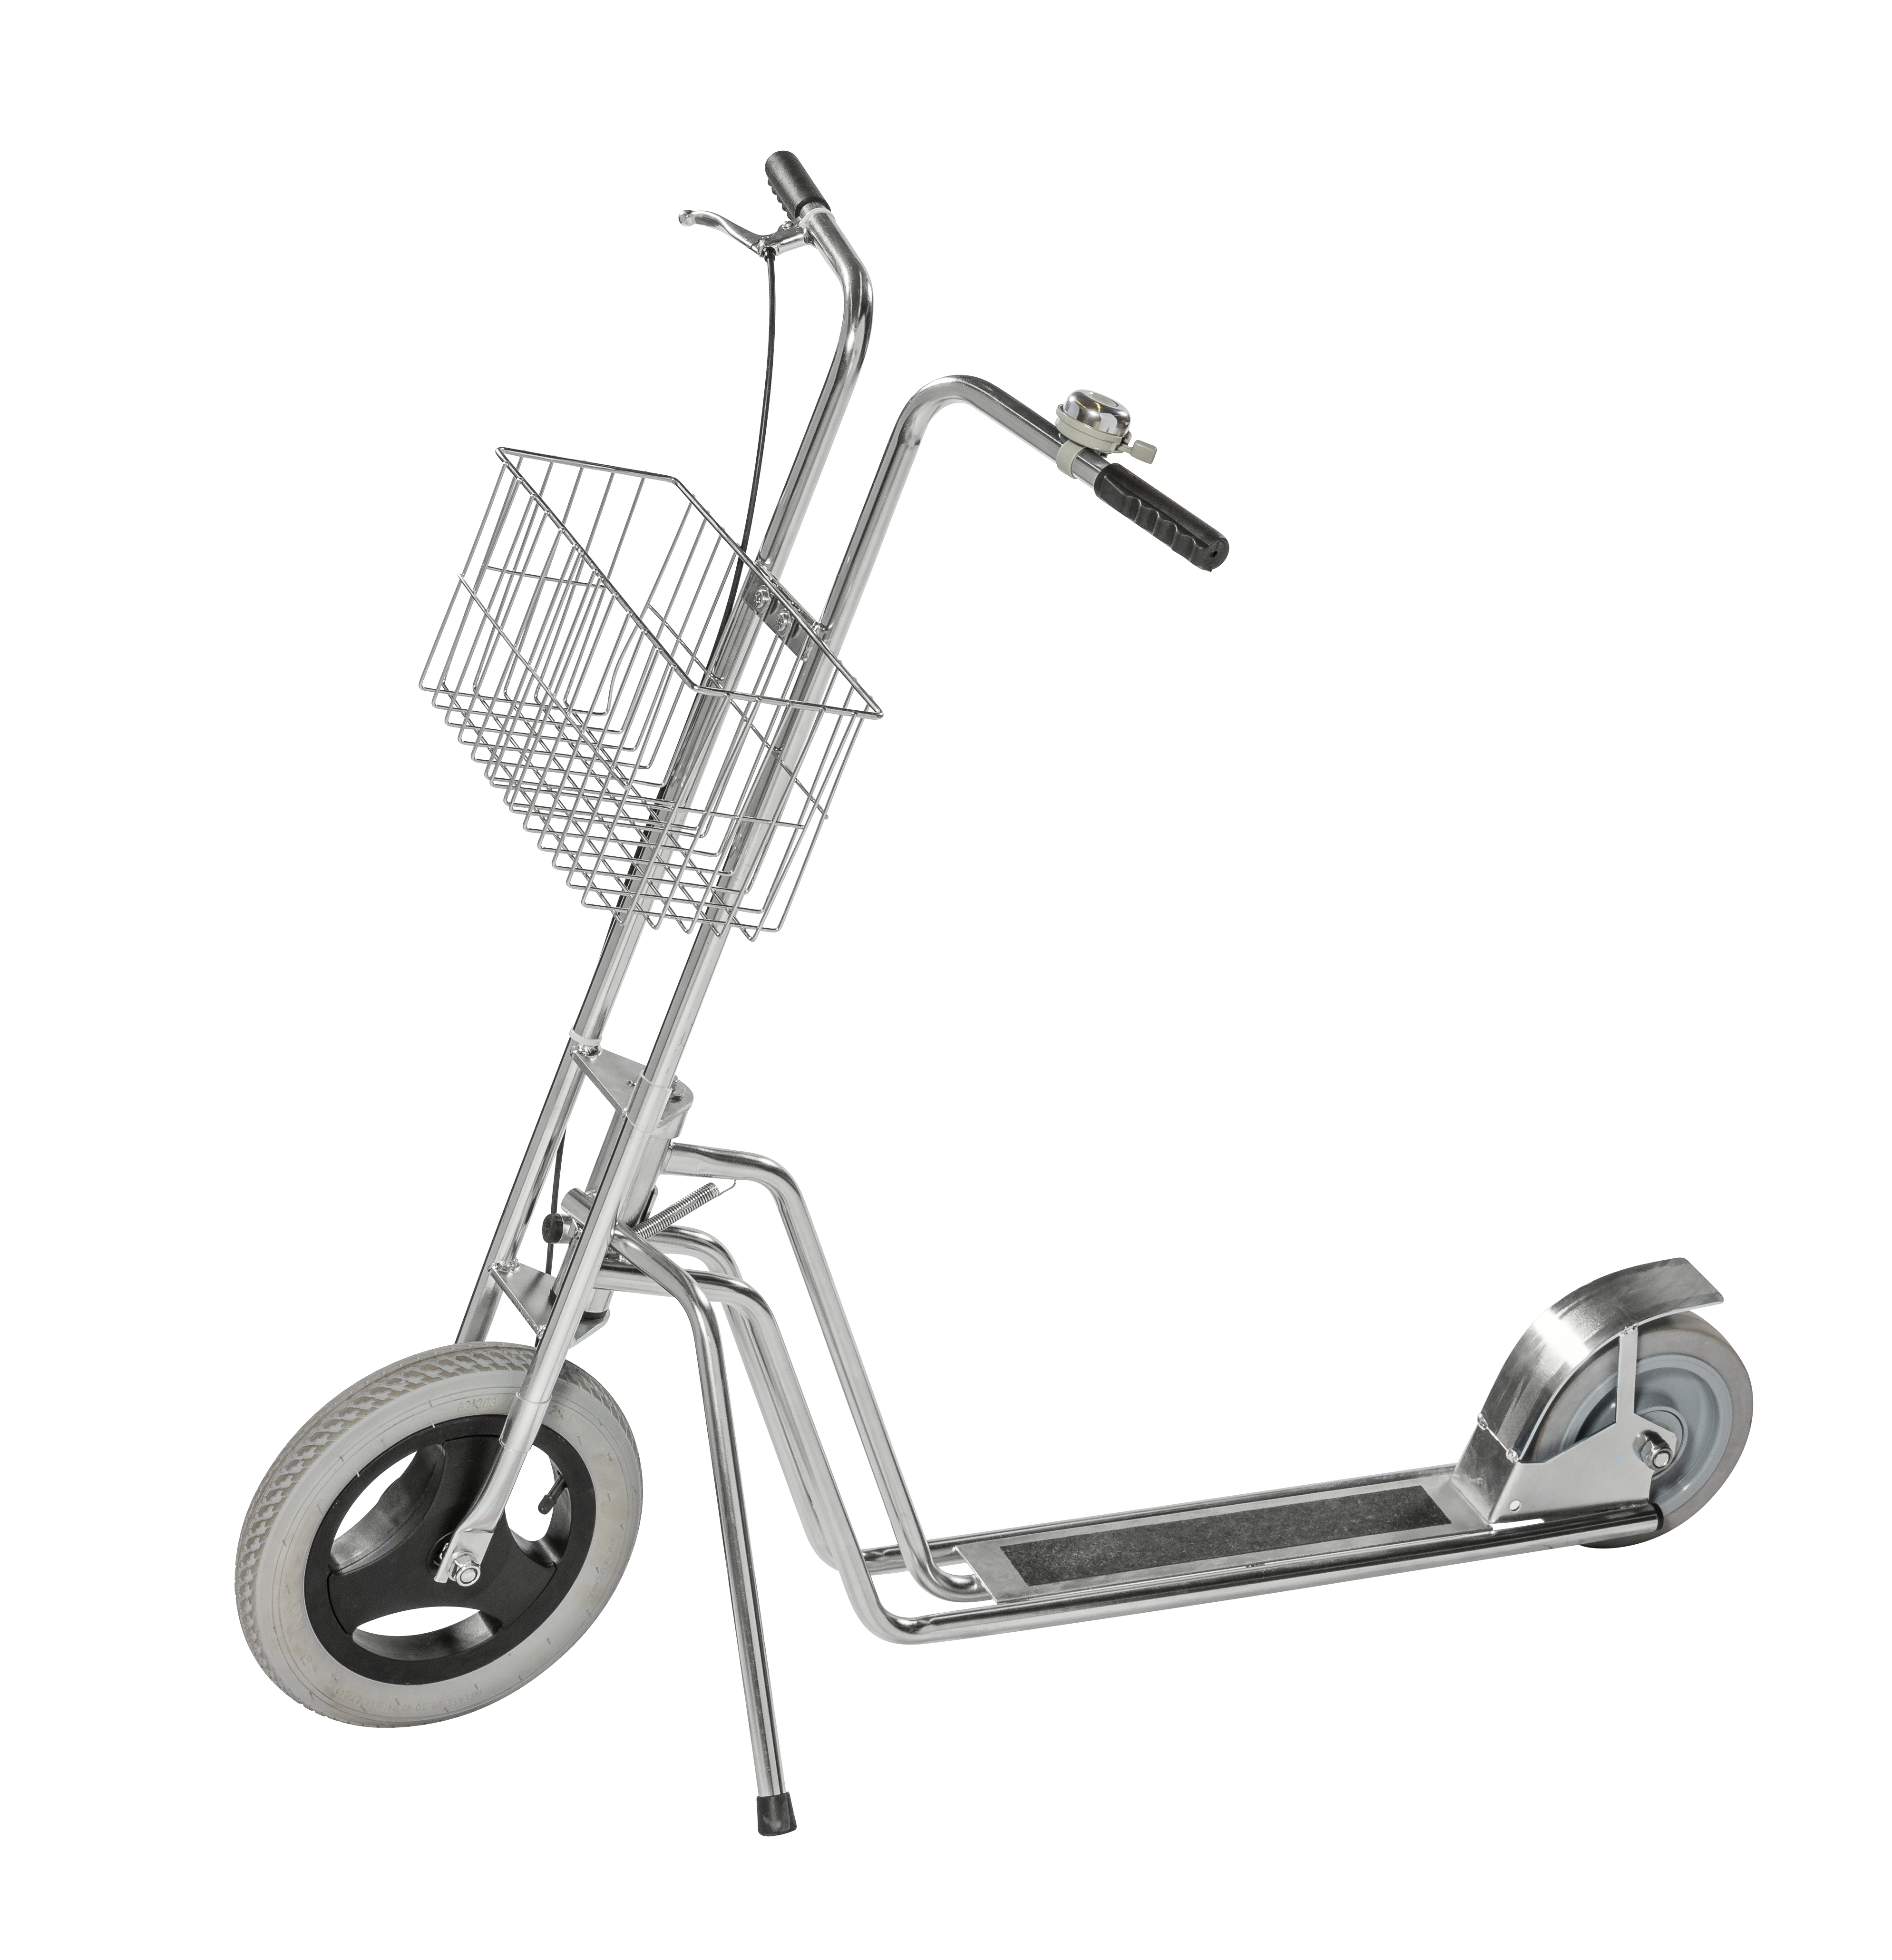 KM07340 | Platform scooter